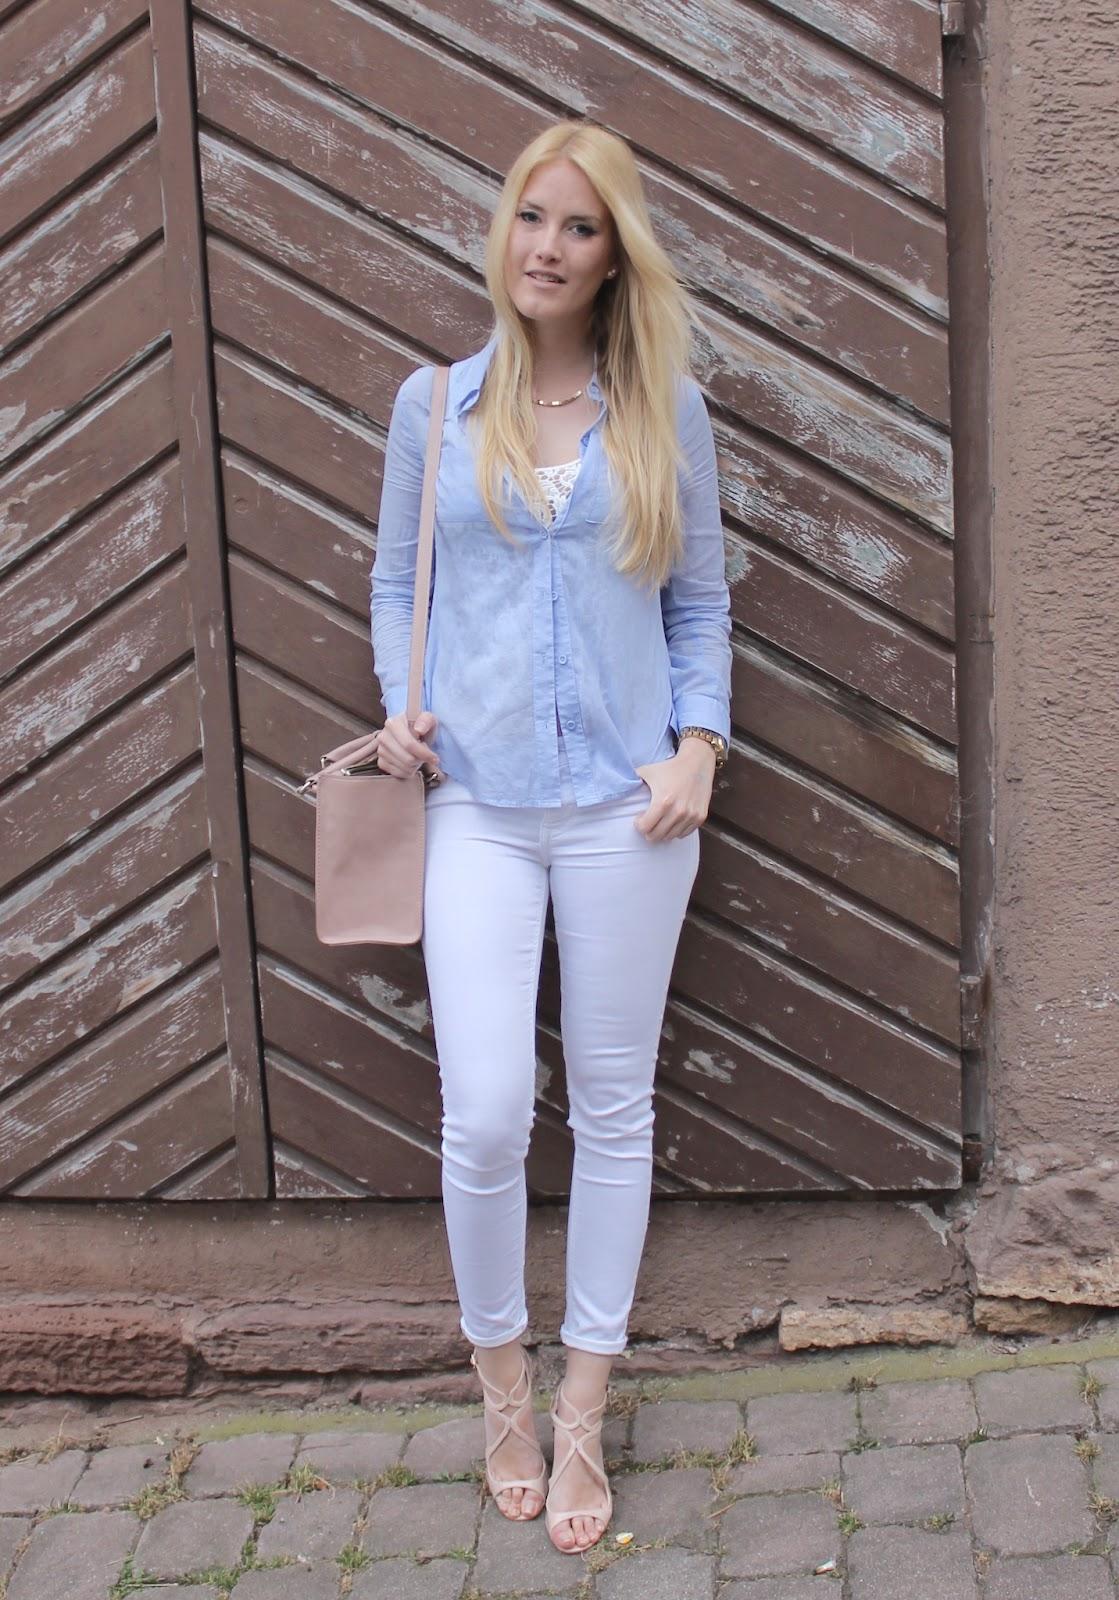 TheBlondeLion x Schuhtempel24 linen blouse blue nude heels white denim http://www.theblondelion.com/2015/03/look-blue-linen-nude-heels-schuhtempel24.html